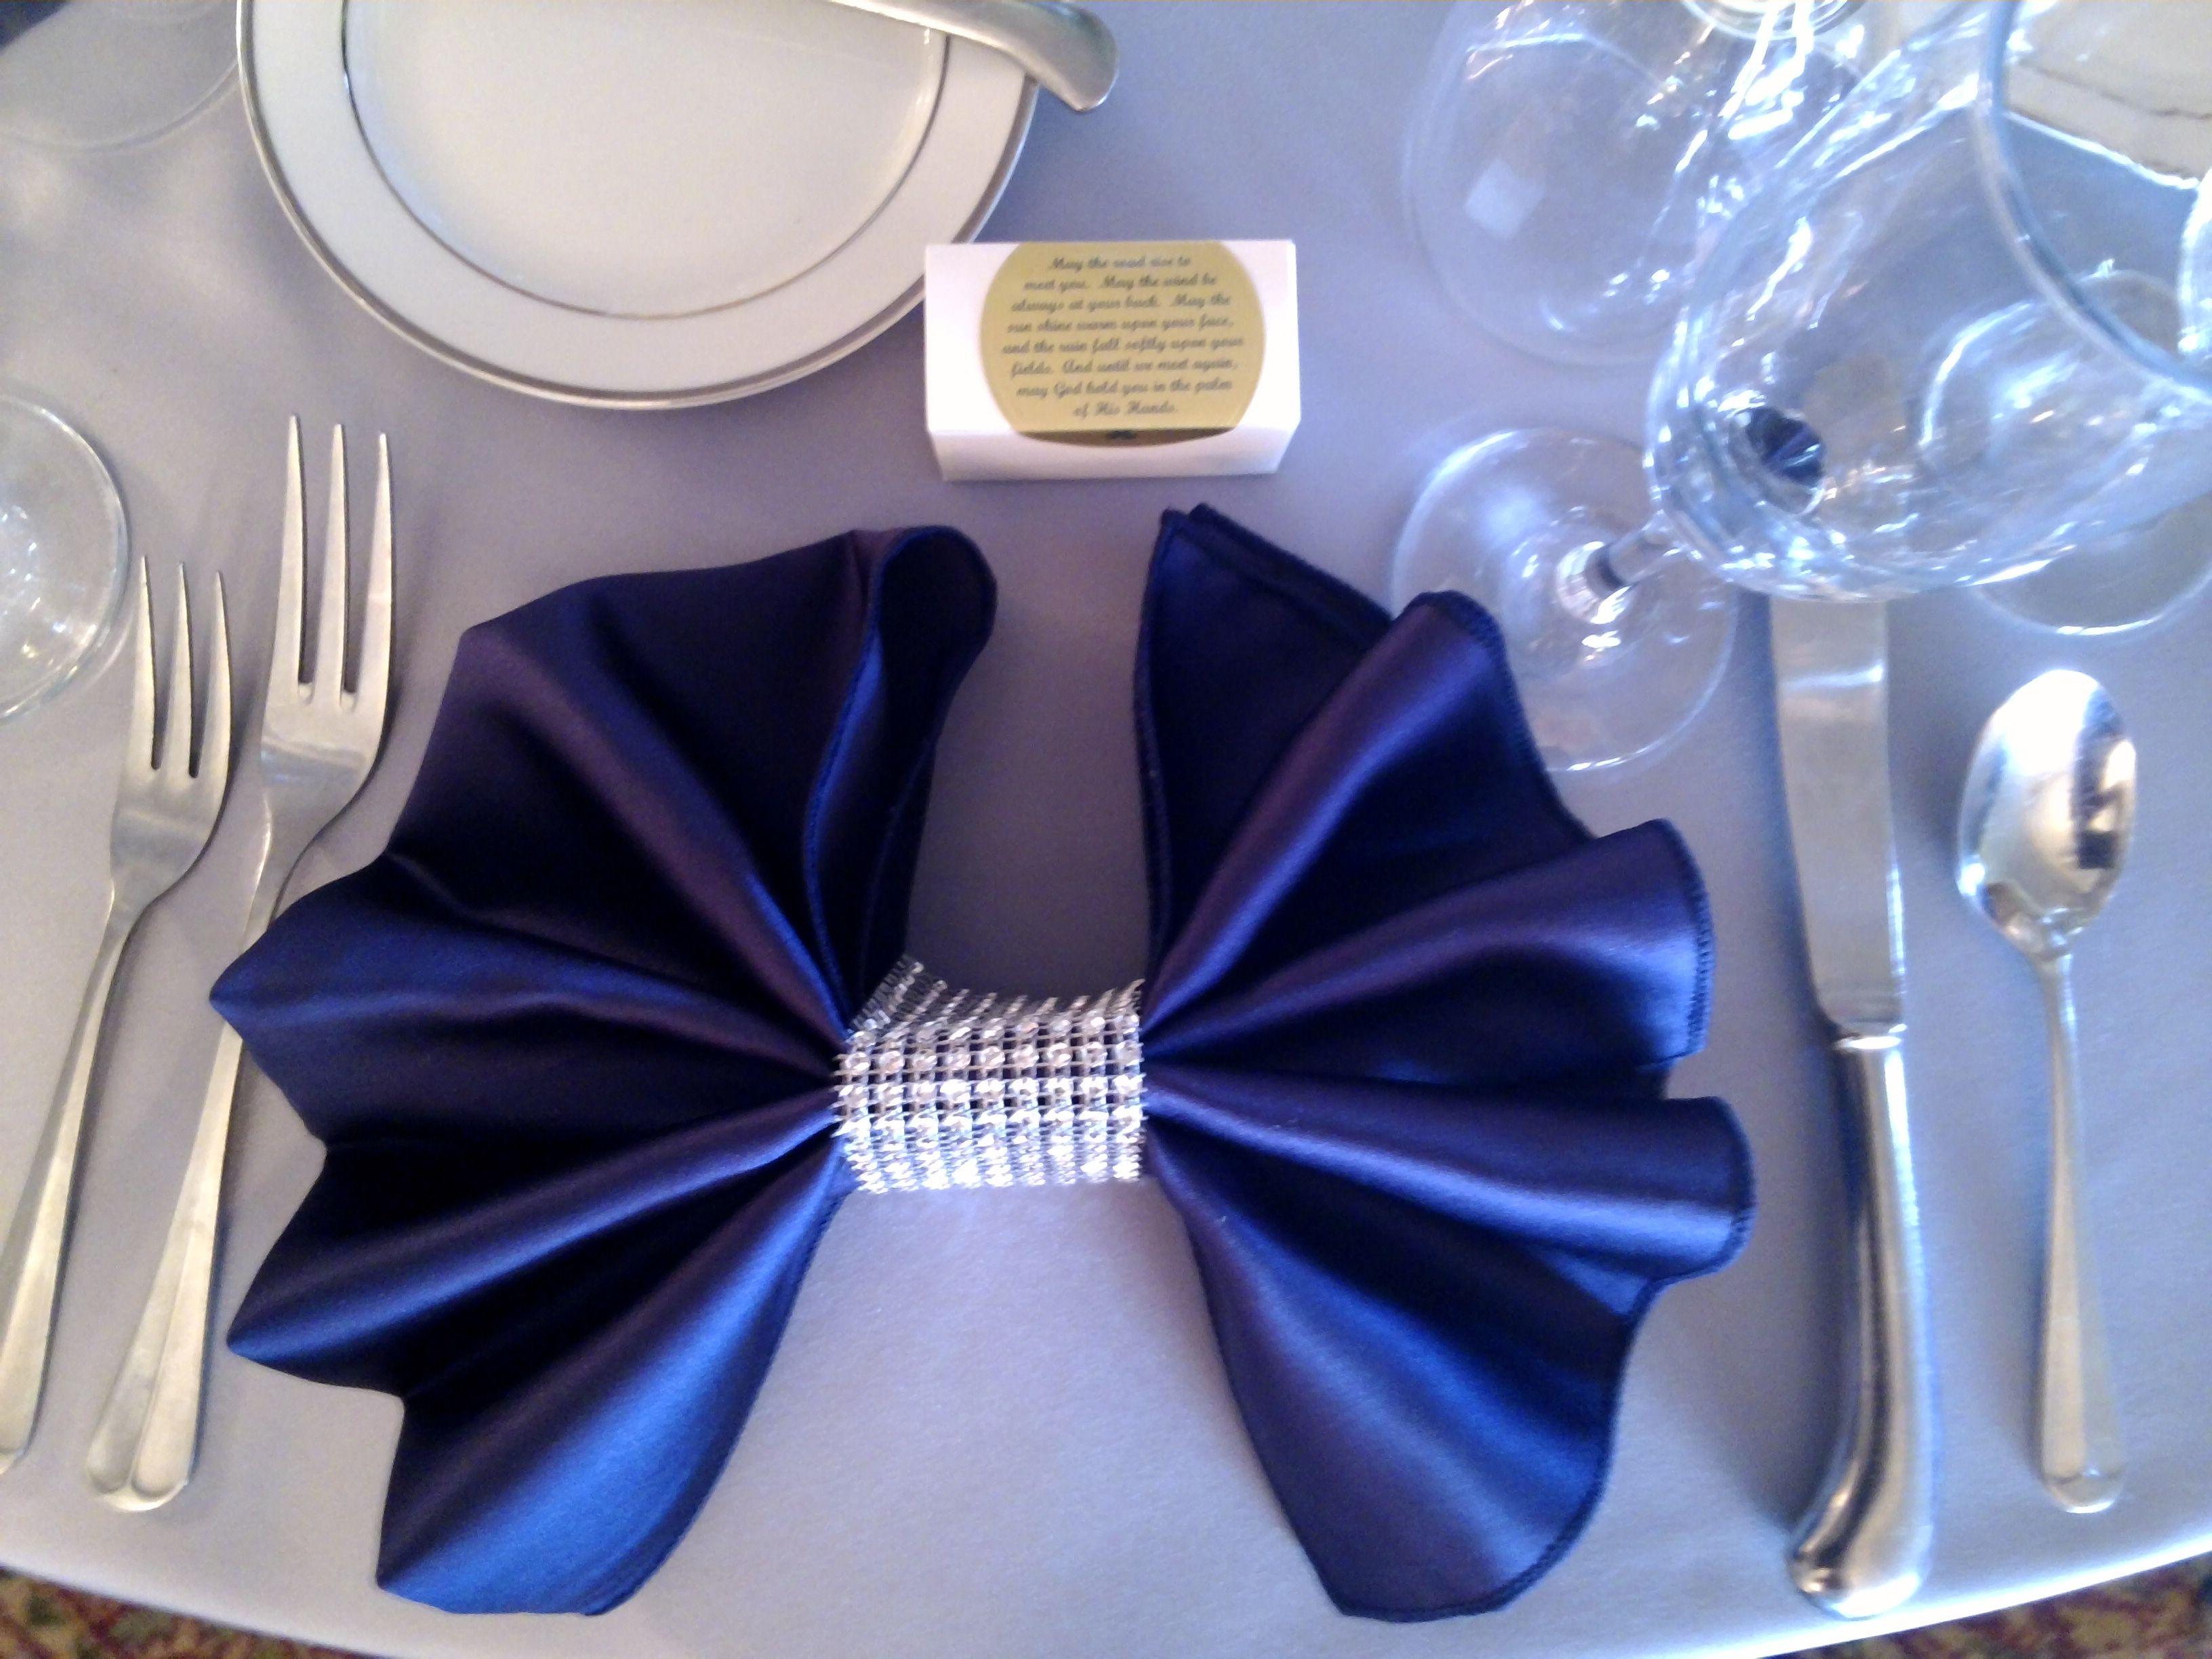 Fun Bow Tie Napkin Fold With Silver Rhinestone Napkin